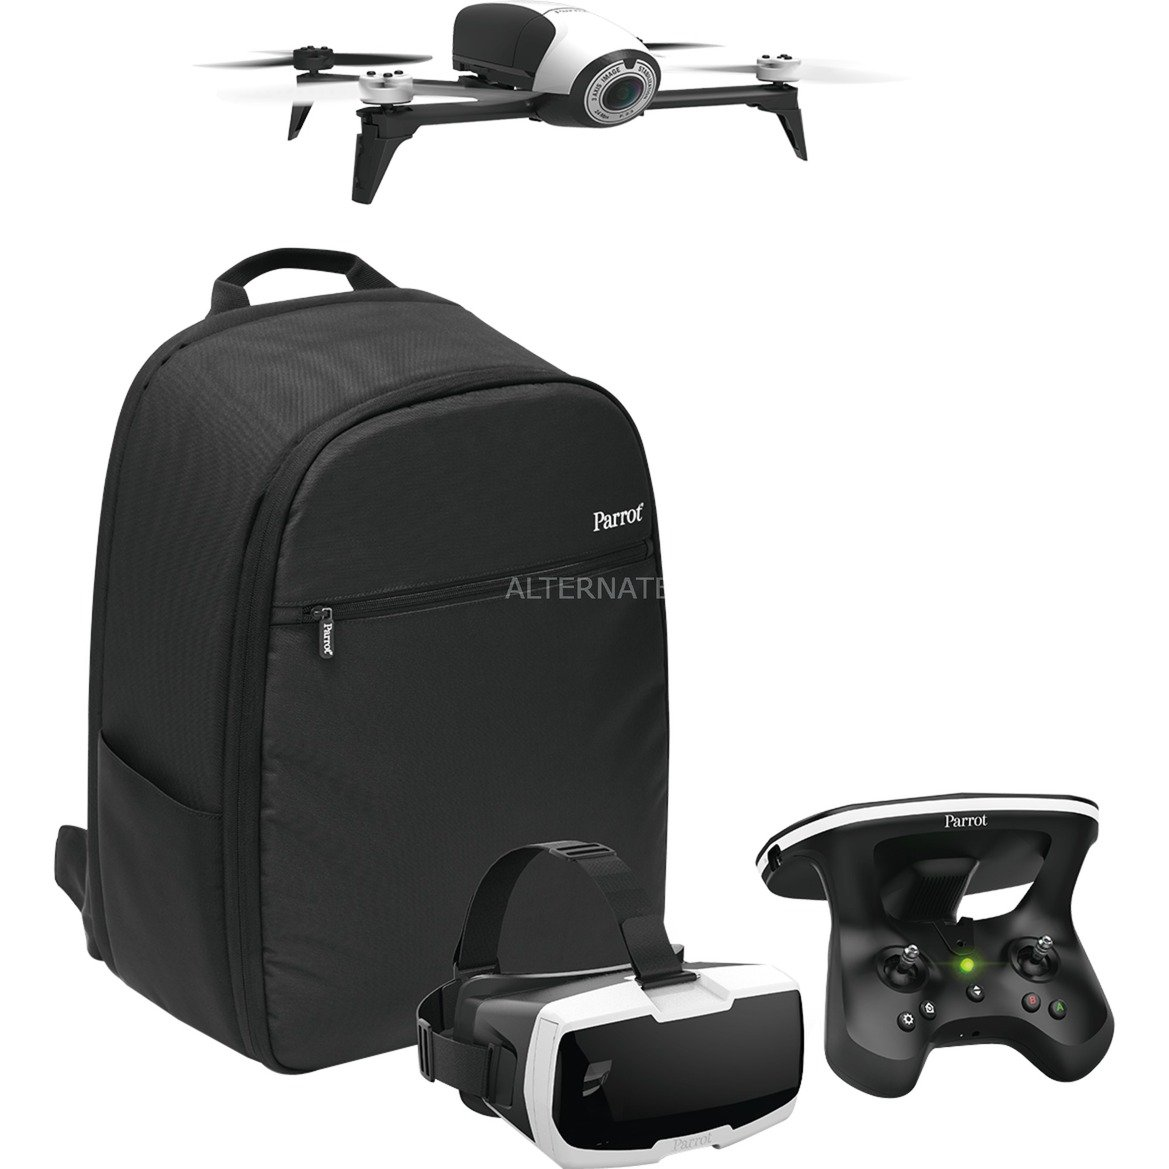 Bebop 2 Adventurer 4rotors 14MP 1920 x 1080pixels 2700mAh Noir, Blanc caméra drone